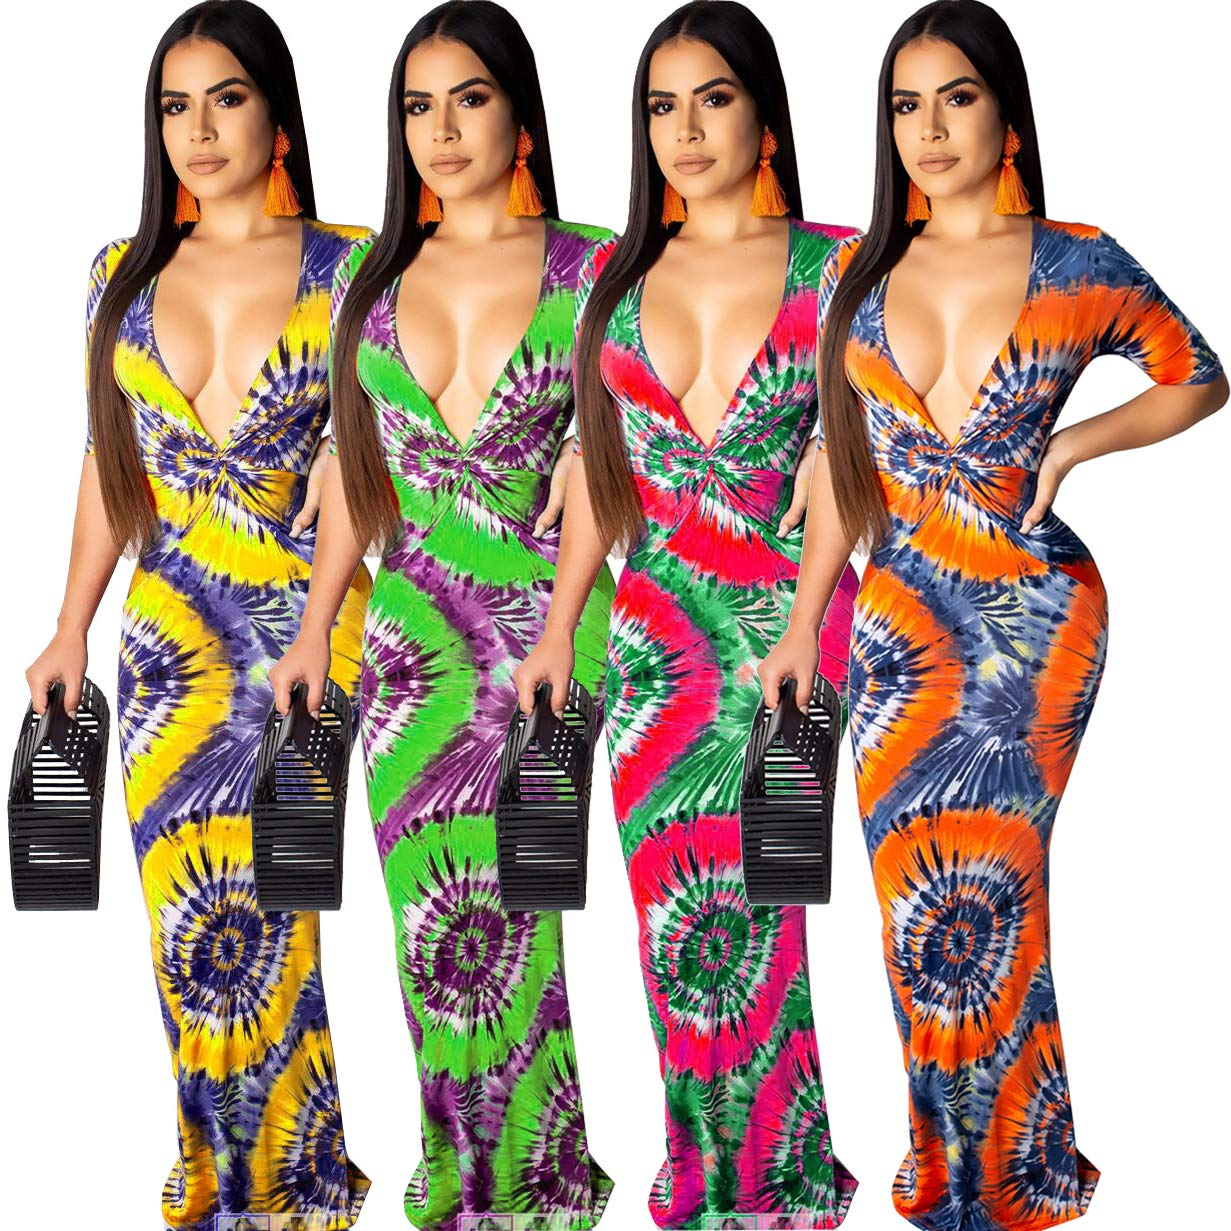 Choichic Women\'s Summer Bodycon Maxi Dress - Sexy Deep V Neck Short Sleeve Tie Dye Dresses Large Green